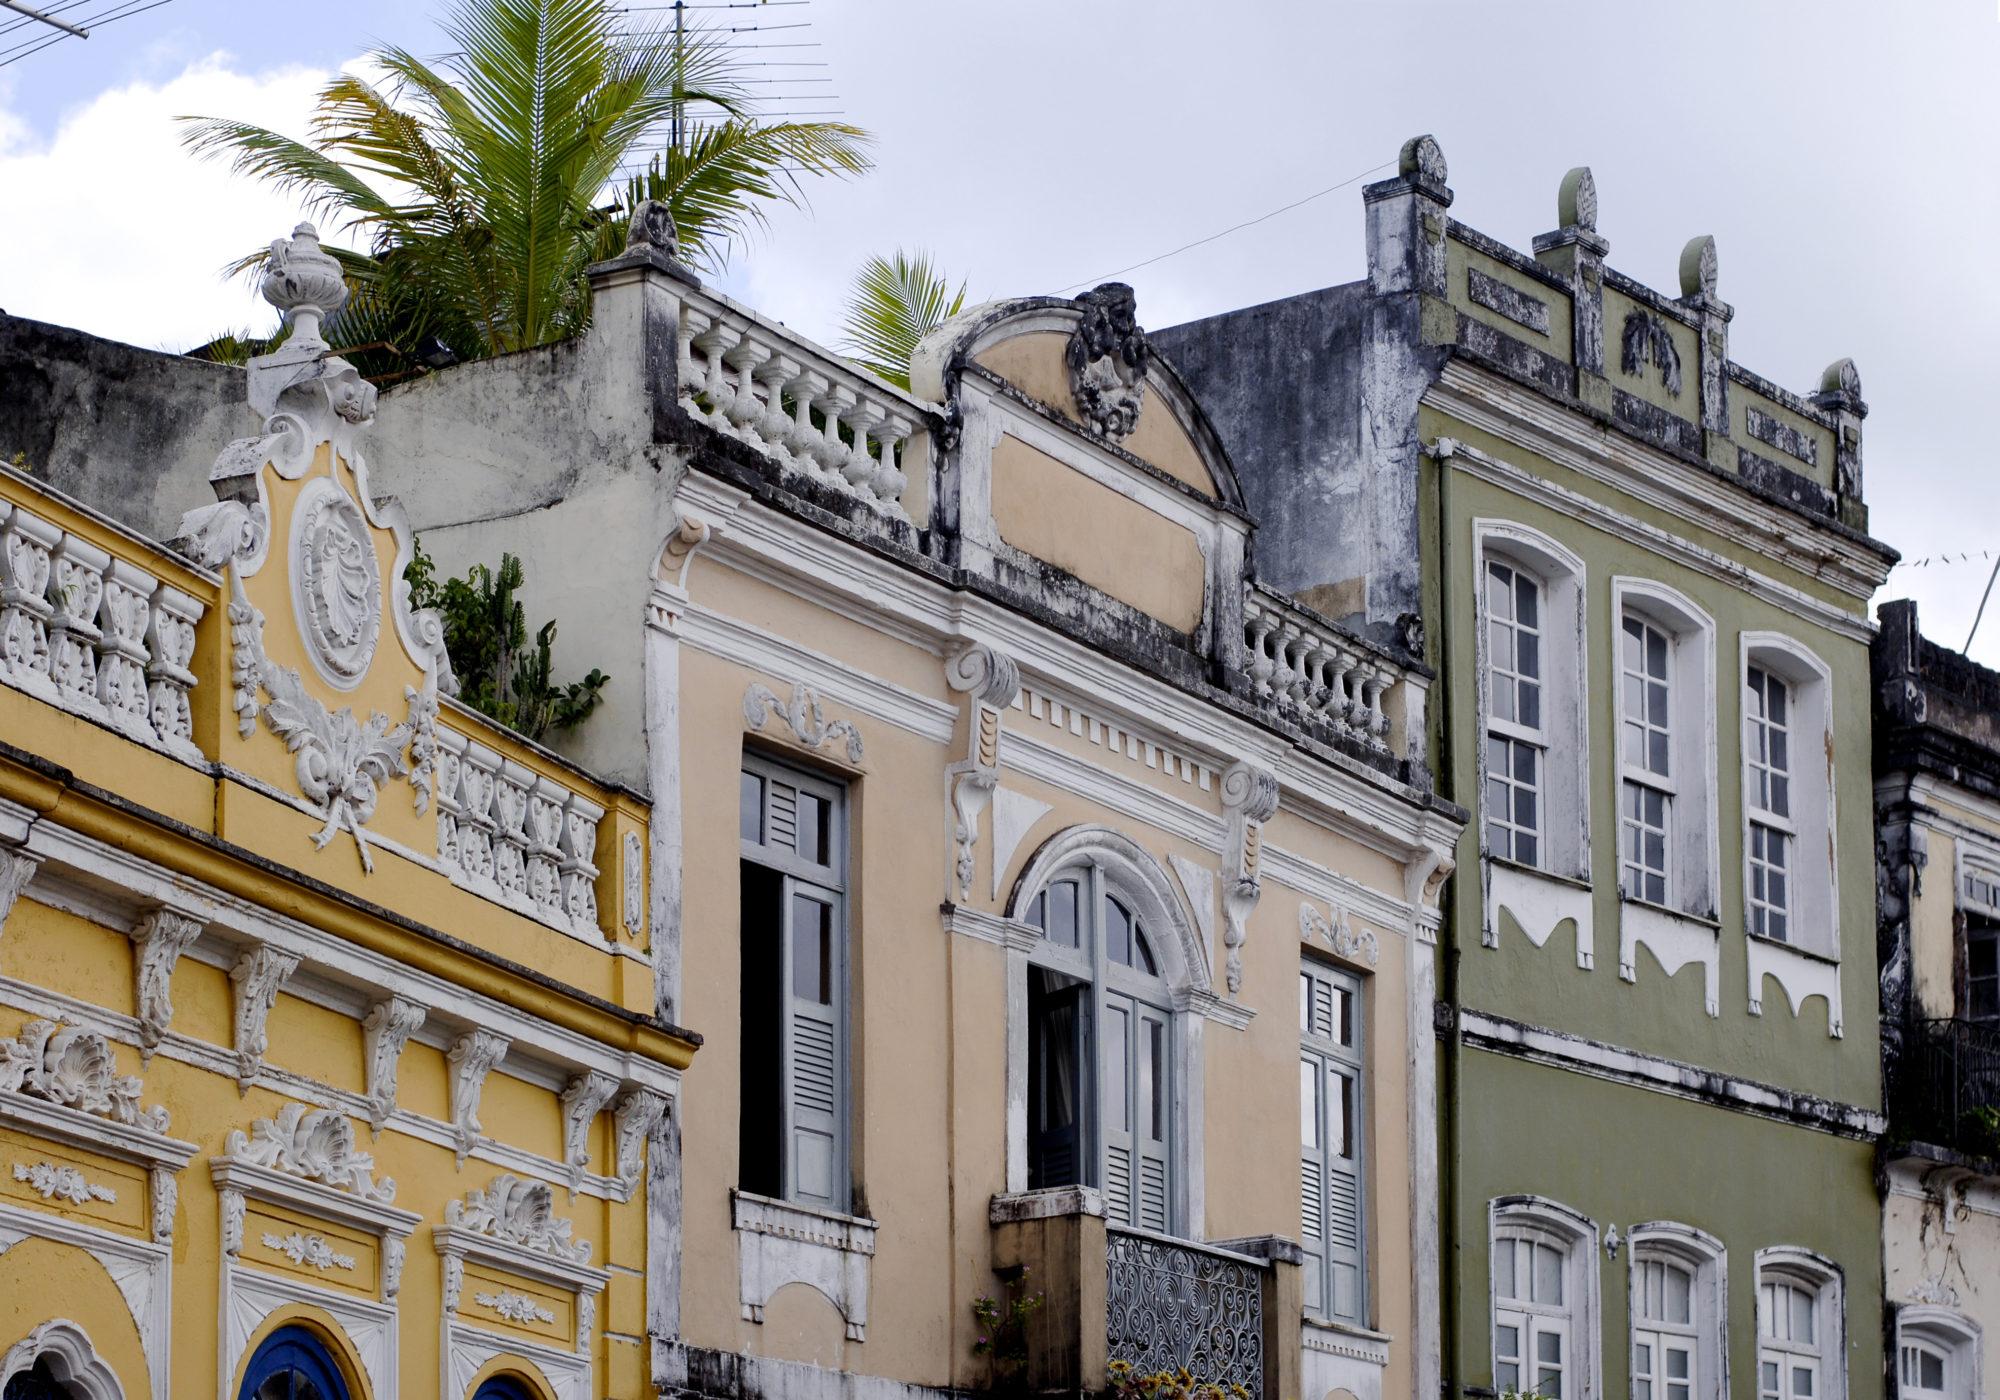 Case in stile portoghese al pelorinho salvador de bahia for Case in stile